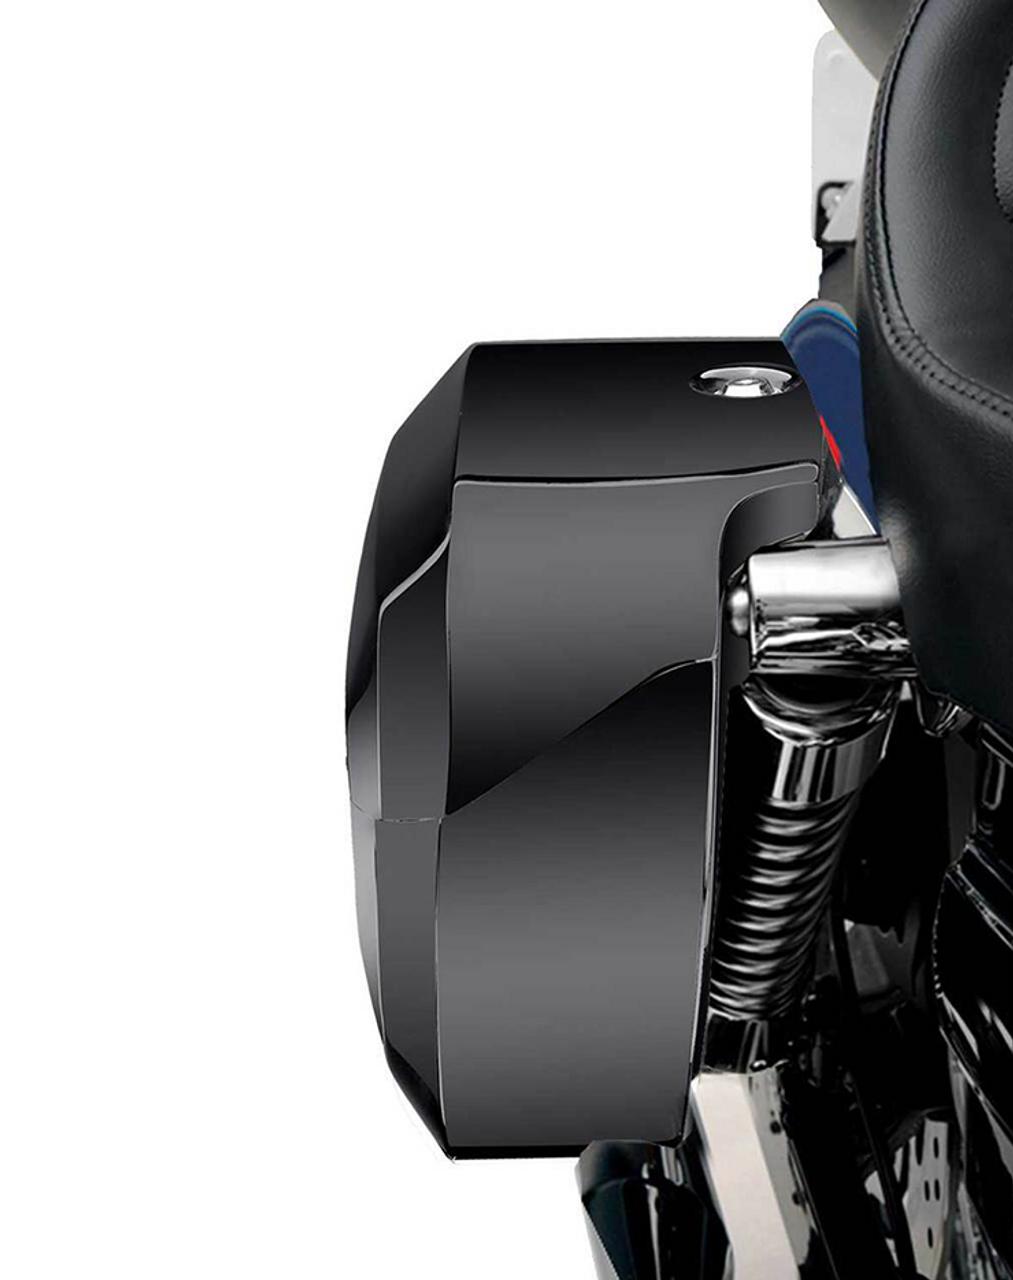 Yamaha Silverado Viking Lamellar Large Painted Shock Cutout Hard Motorcycle Saddlebags Shock Cutout View